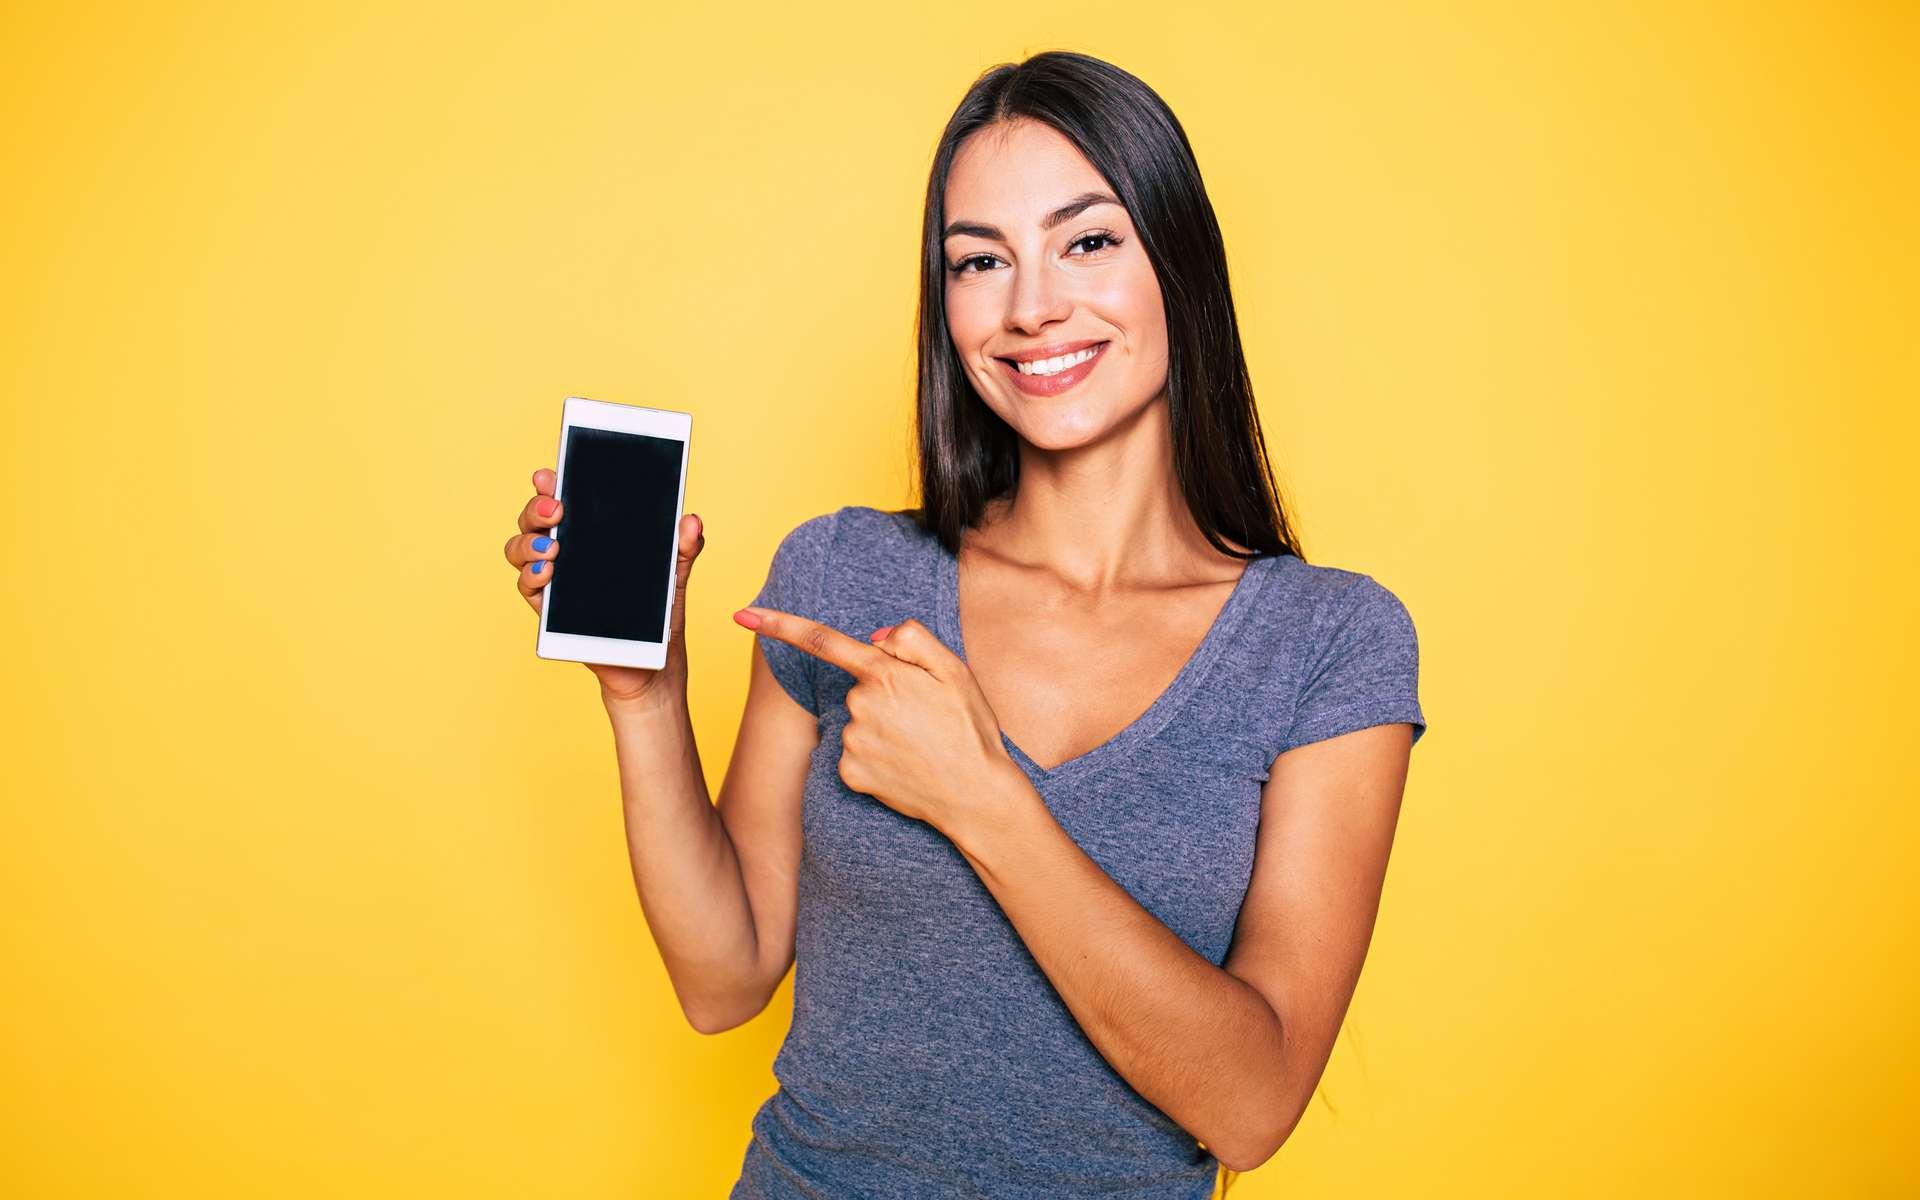 Les meilleurs smartphones à moins de 200 euros © Maksym Povozniuk, Adobe Stock